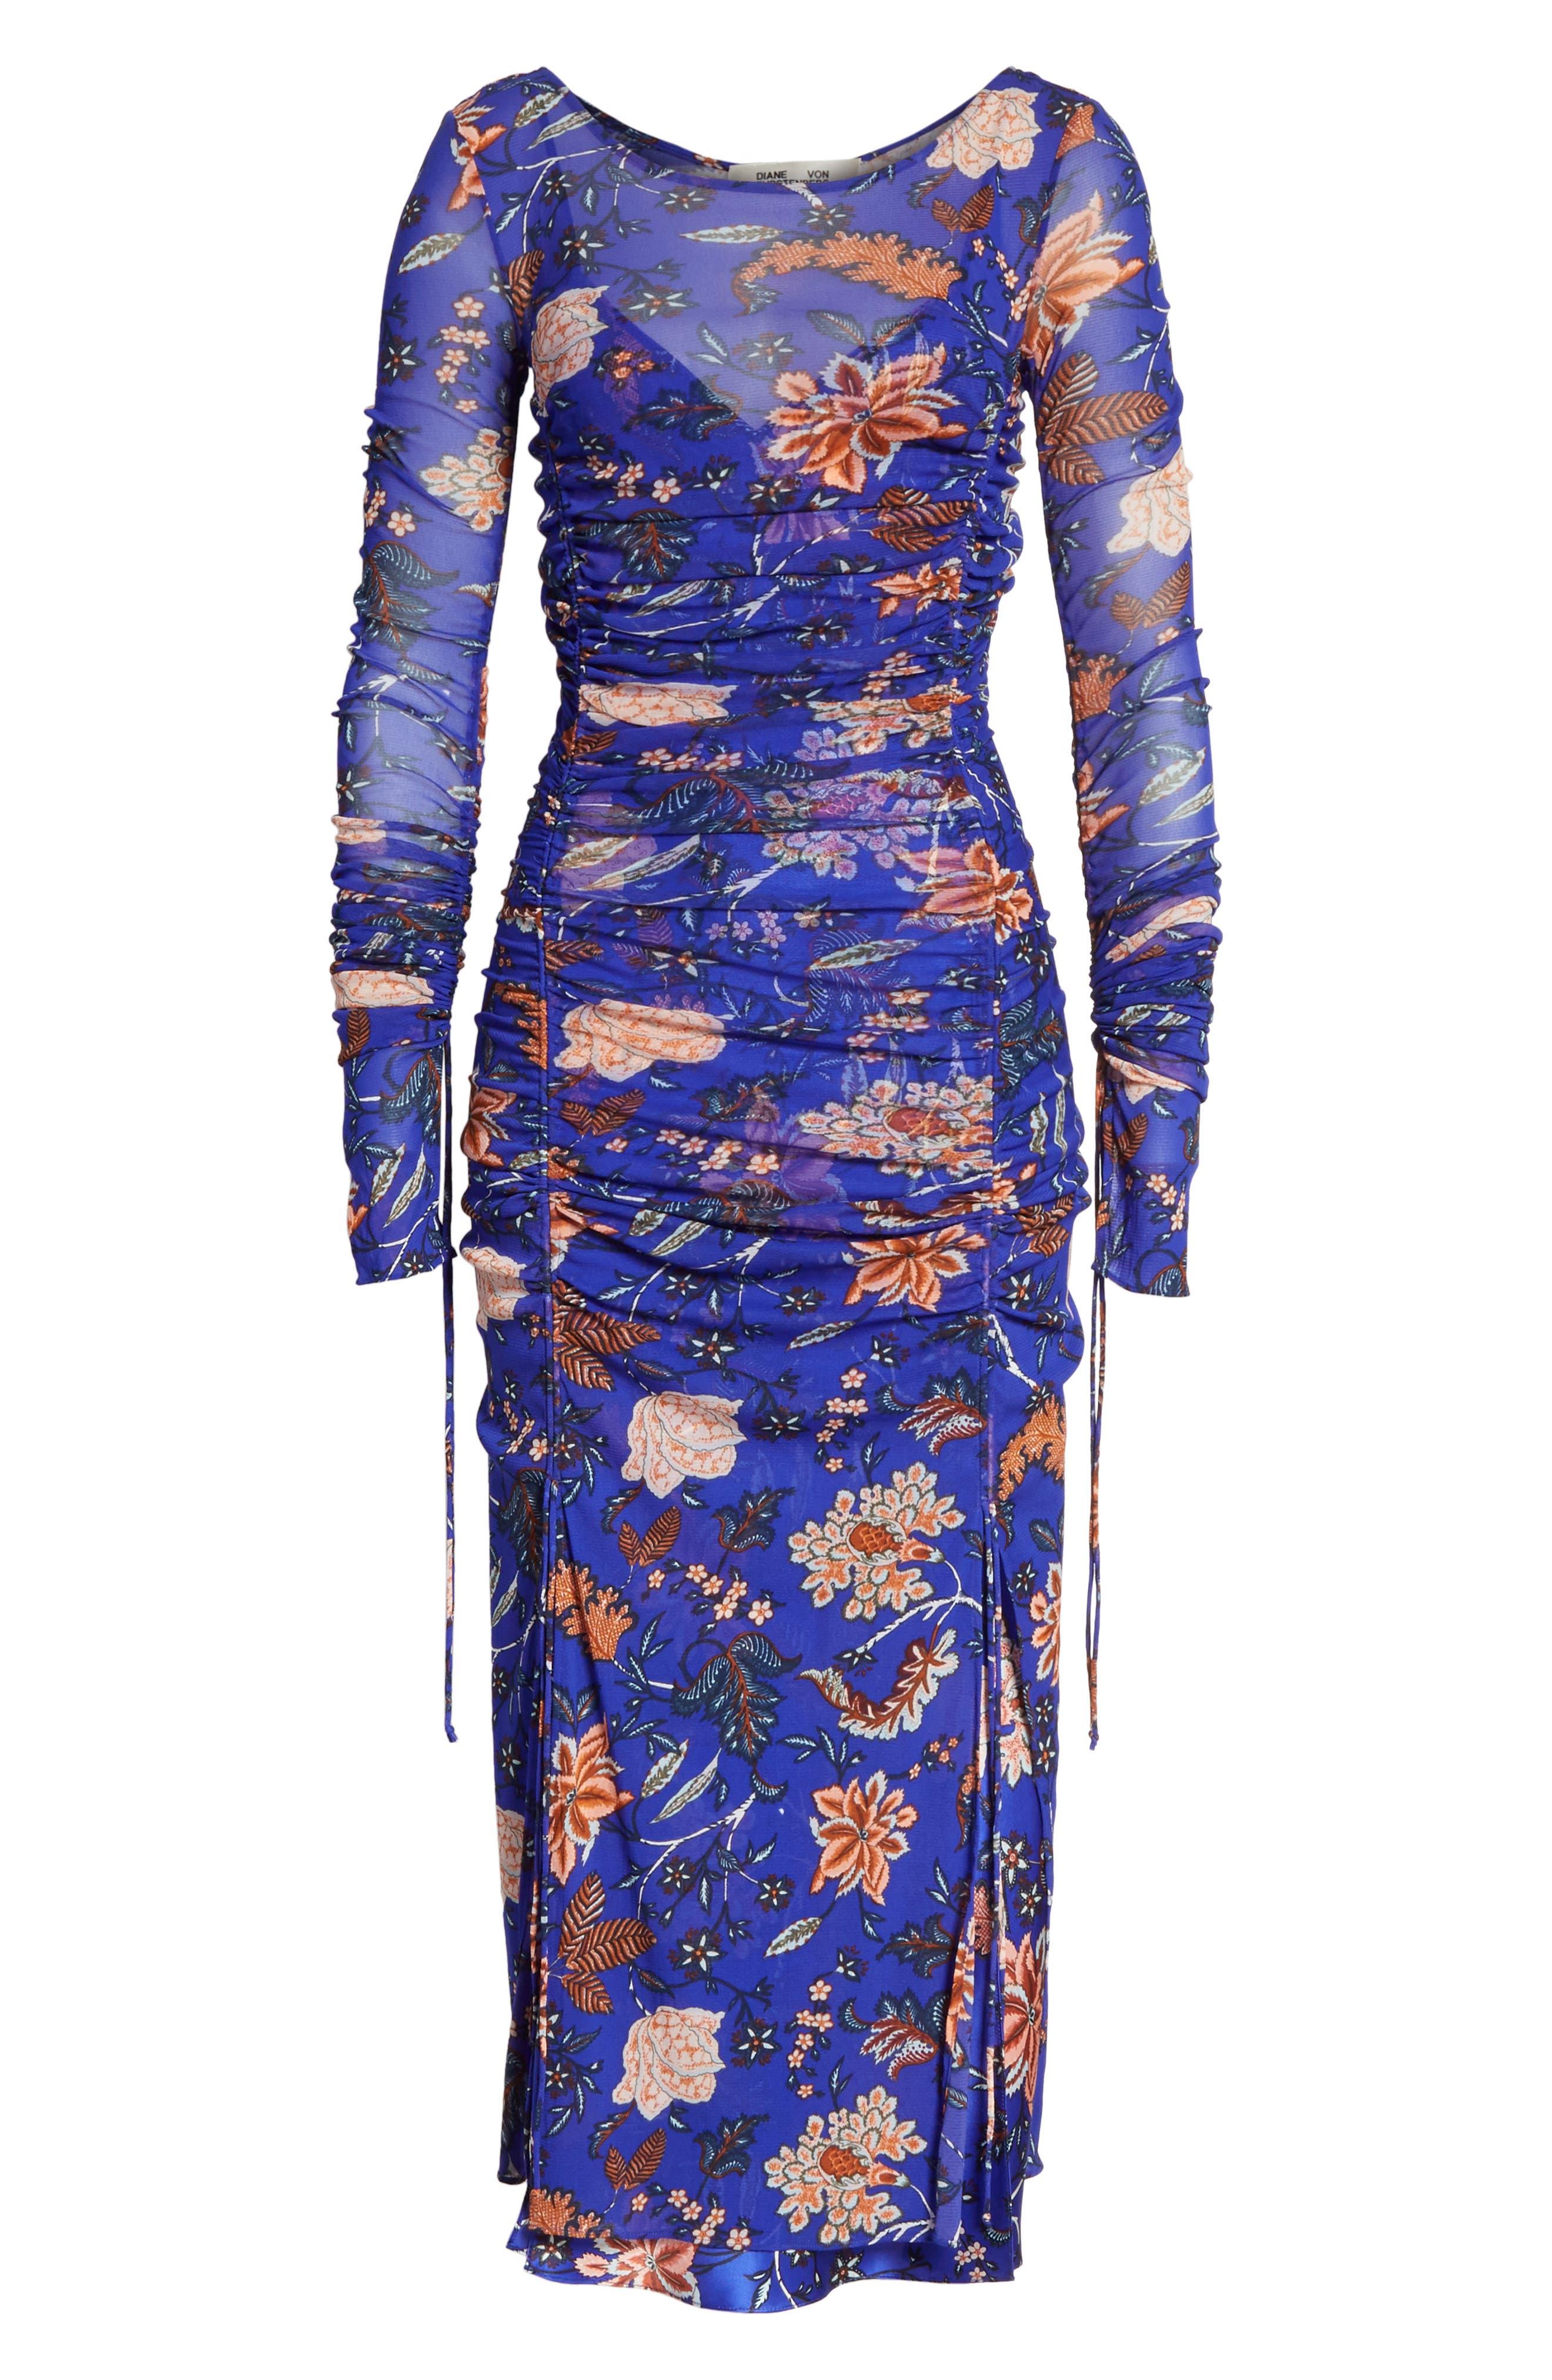 Diane von Furstenberg Mesh Overlay Floral Midi Dress,                             Alternate thumbnail 6, color,                             Canton Electric Blue